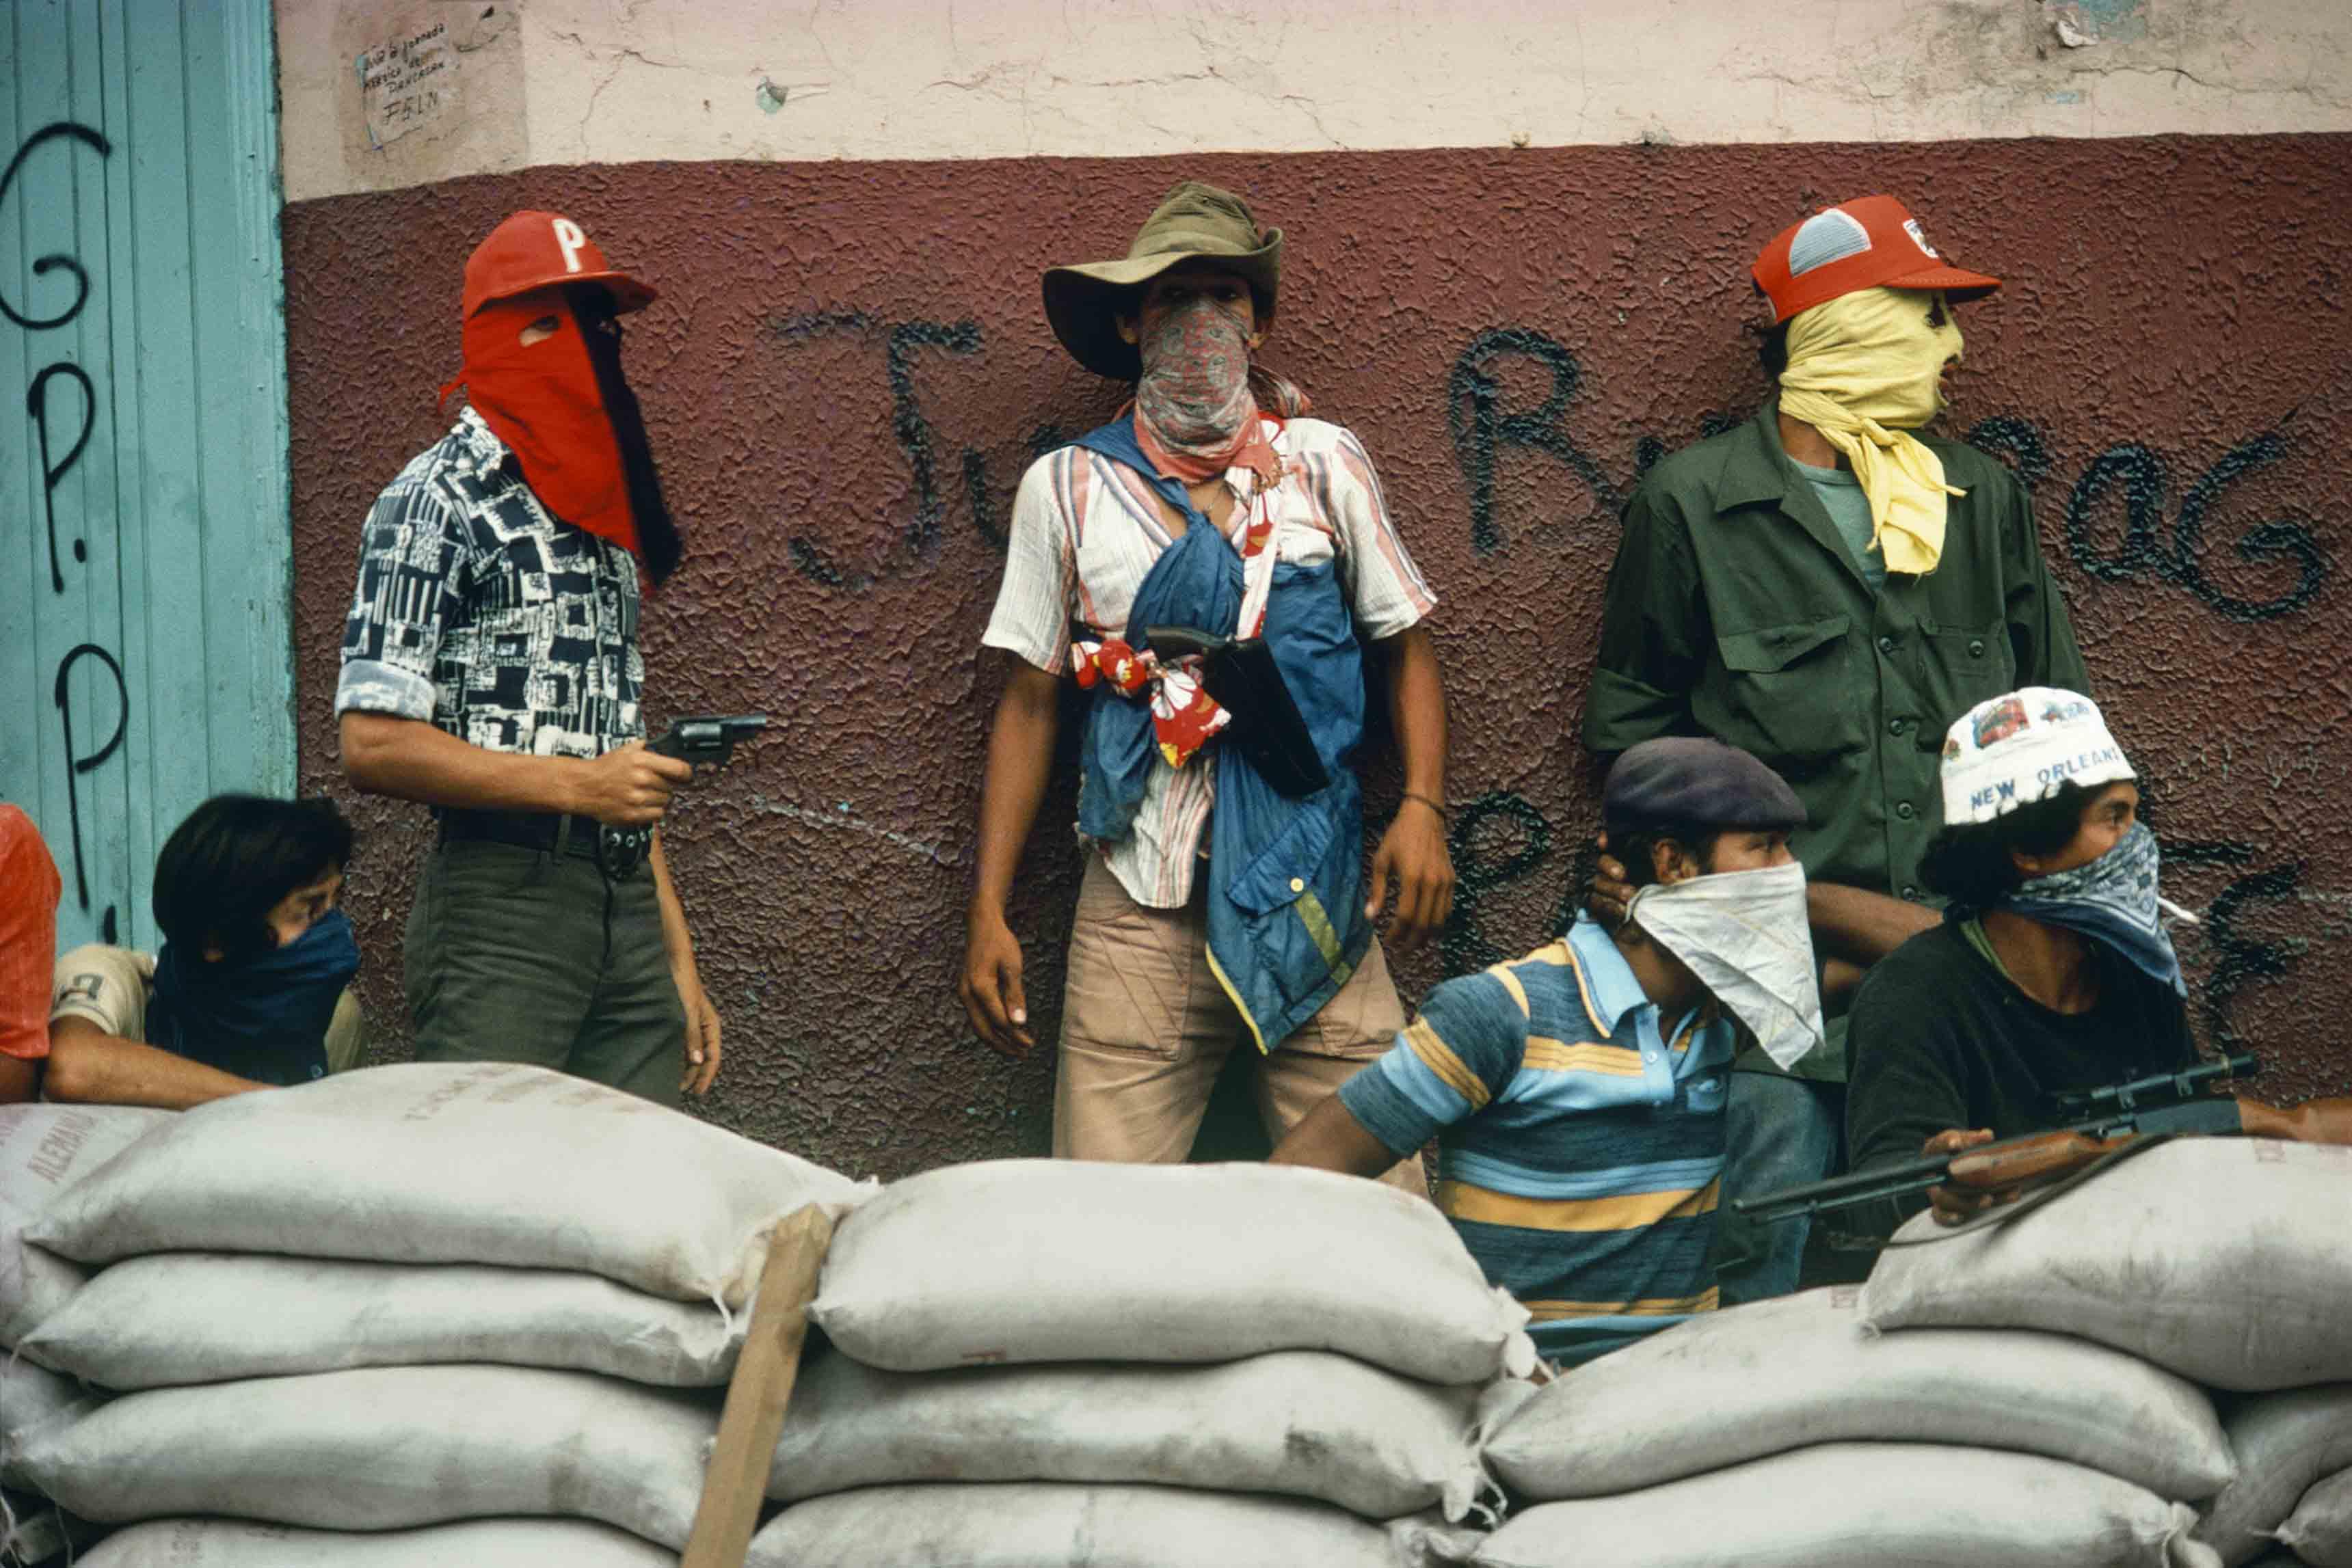 Susan Meiselas, Muchachos attendant la riposte de la Garde nationale, Matagalpa, Nicaragua, 1978 © Susan Meiselas/Magnum Photos